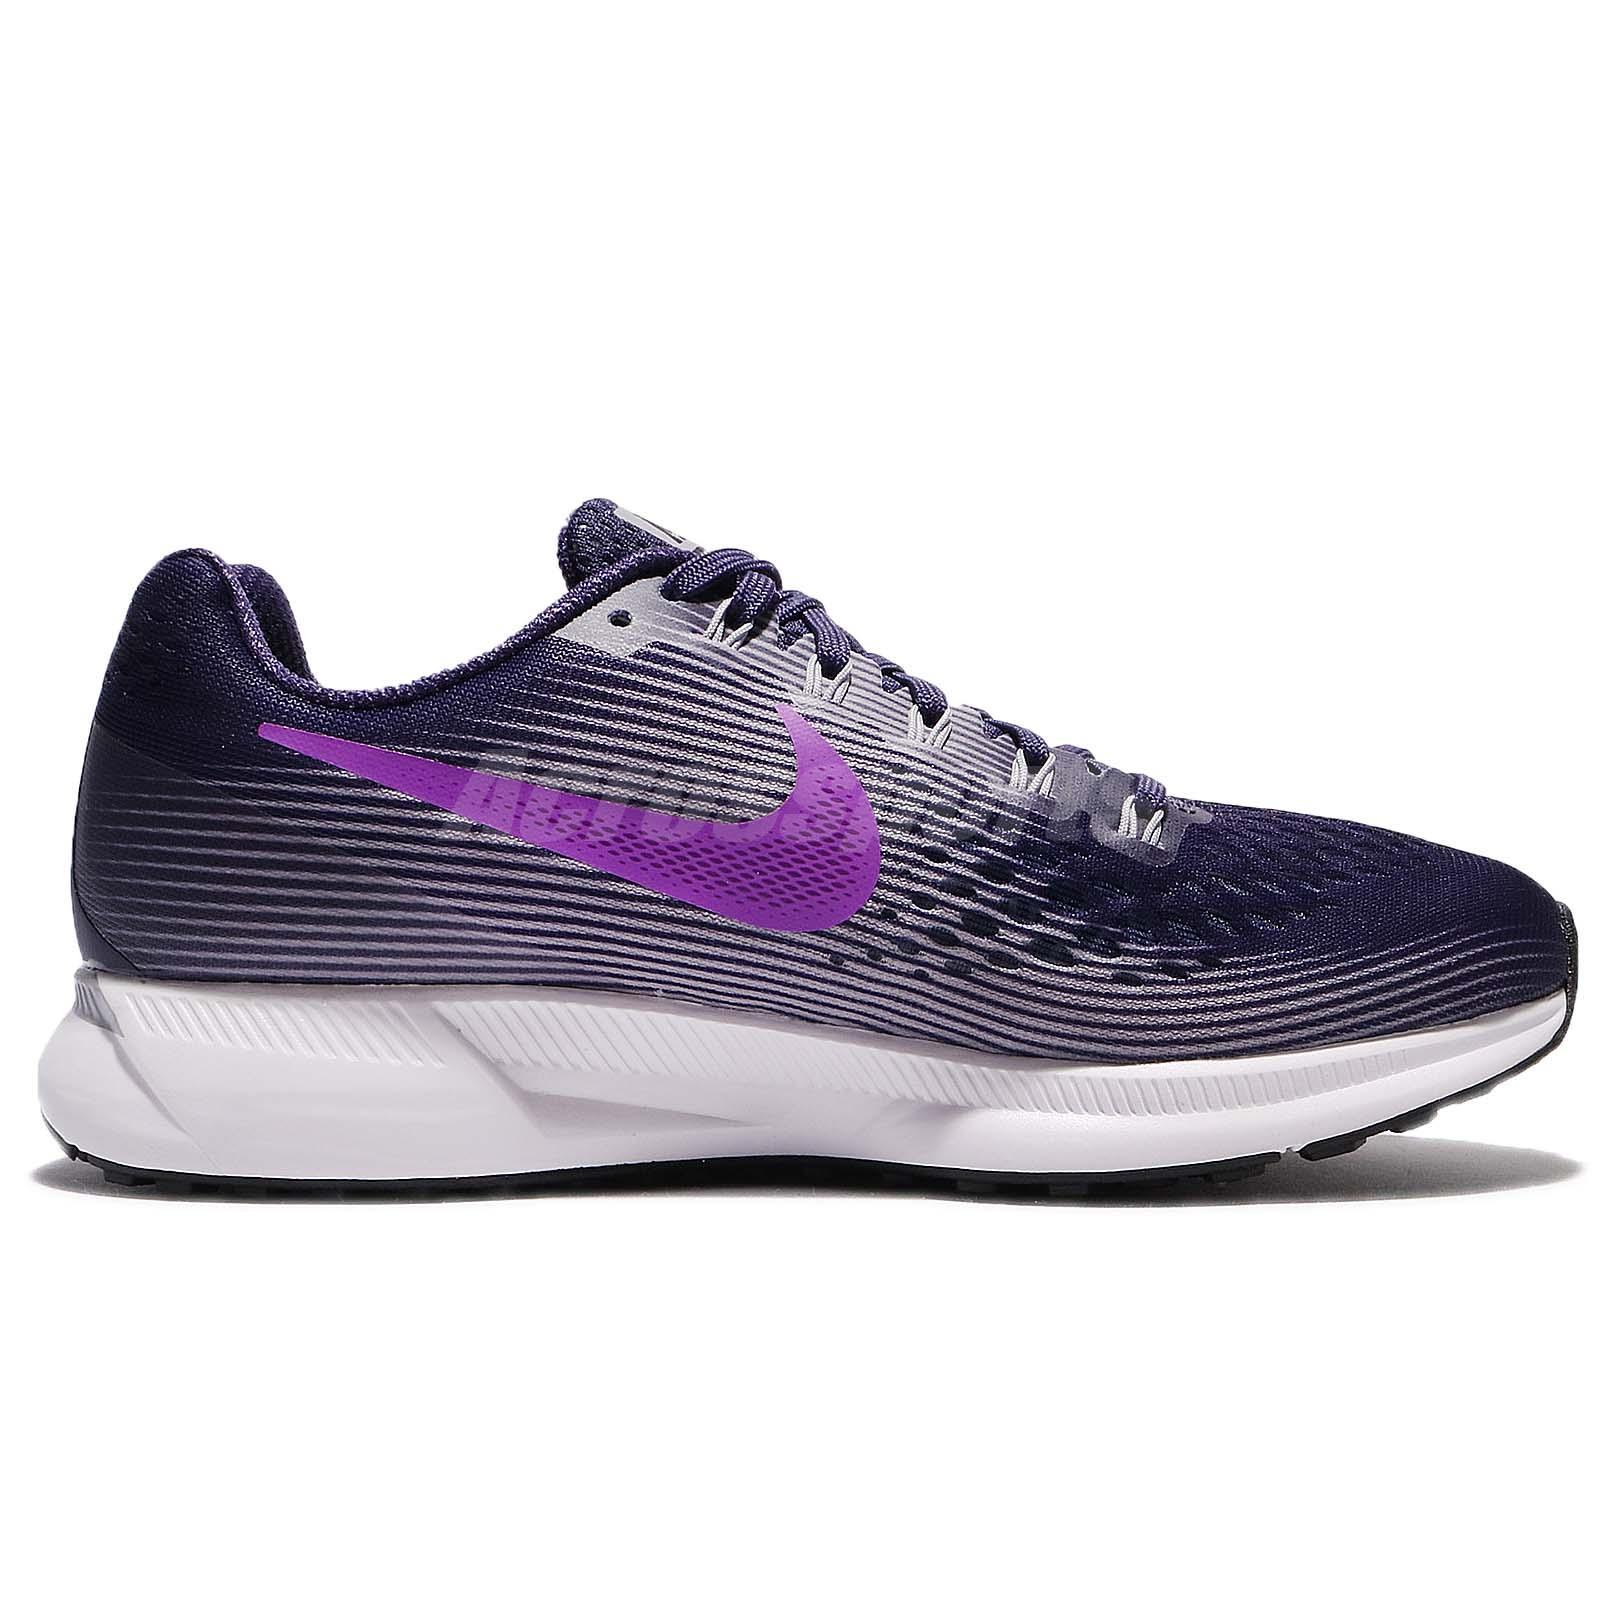 b32aa0b8b94 Wmns Nike Air Zoom Pegasus 34 Ink Hyper Violet Women Running Shoes ...